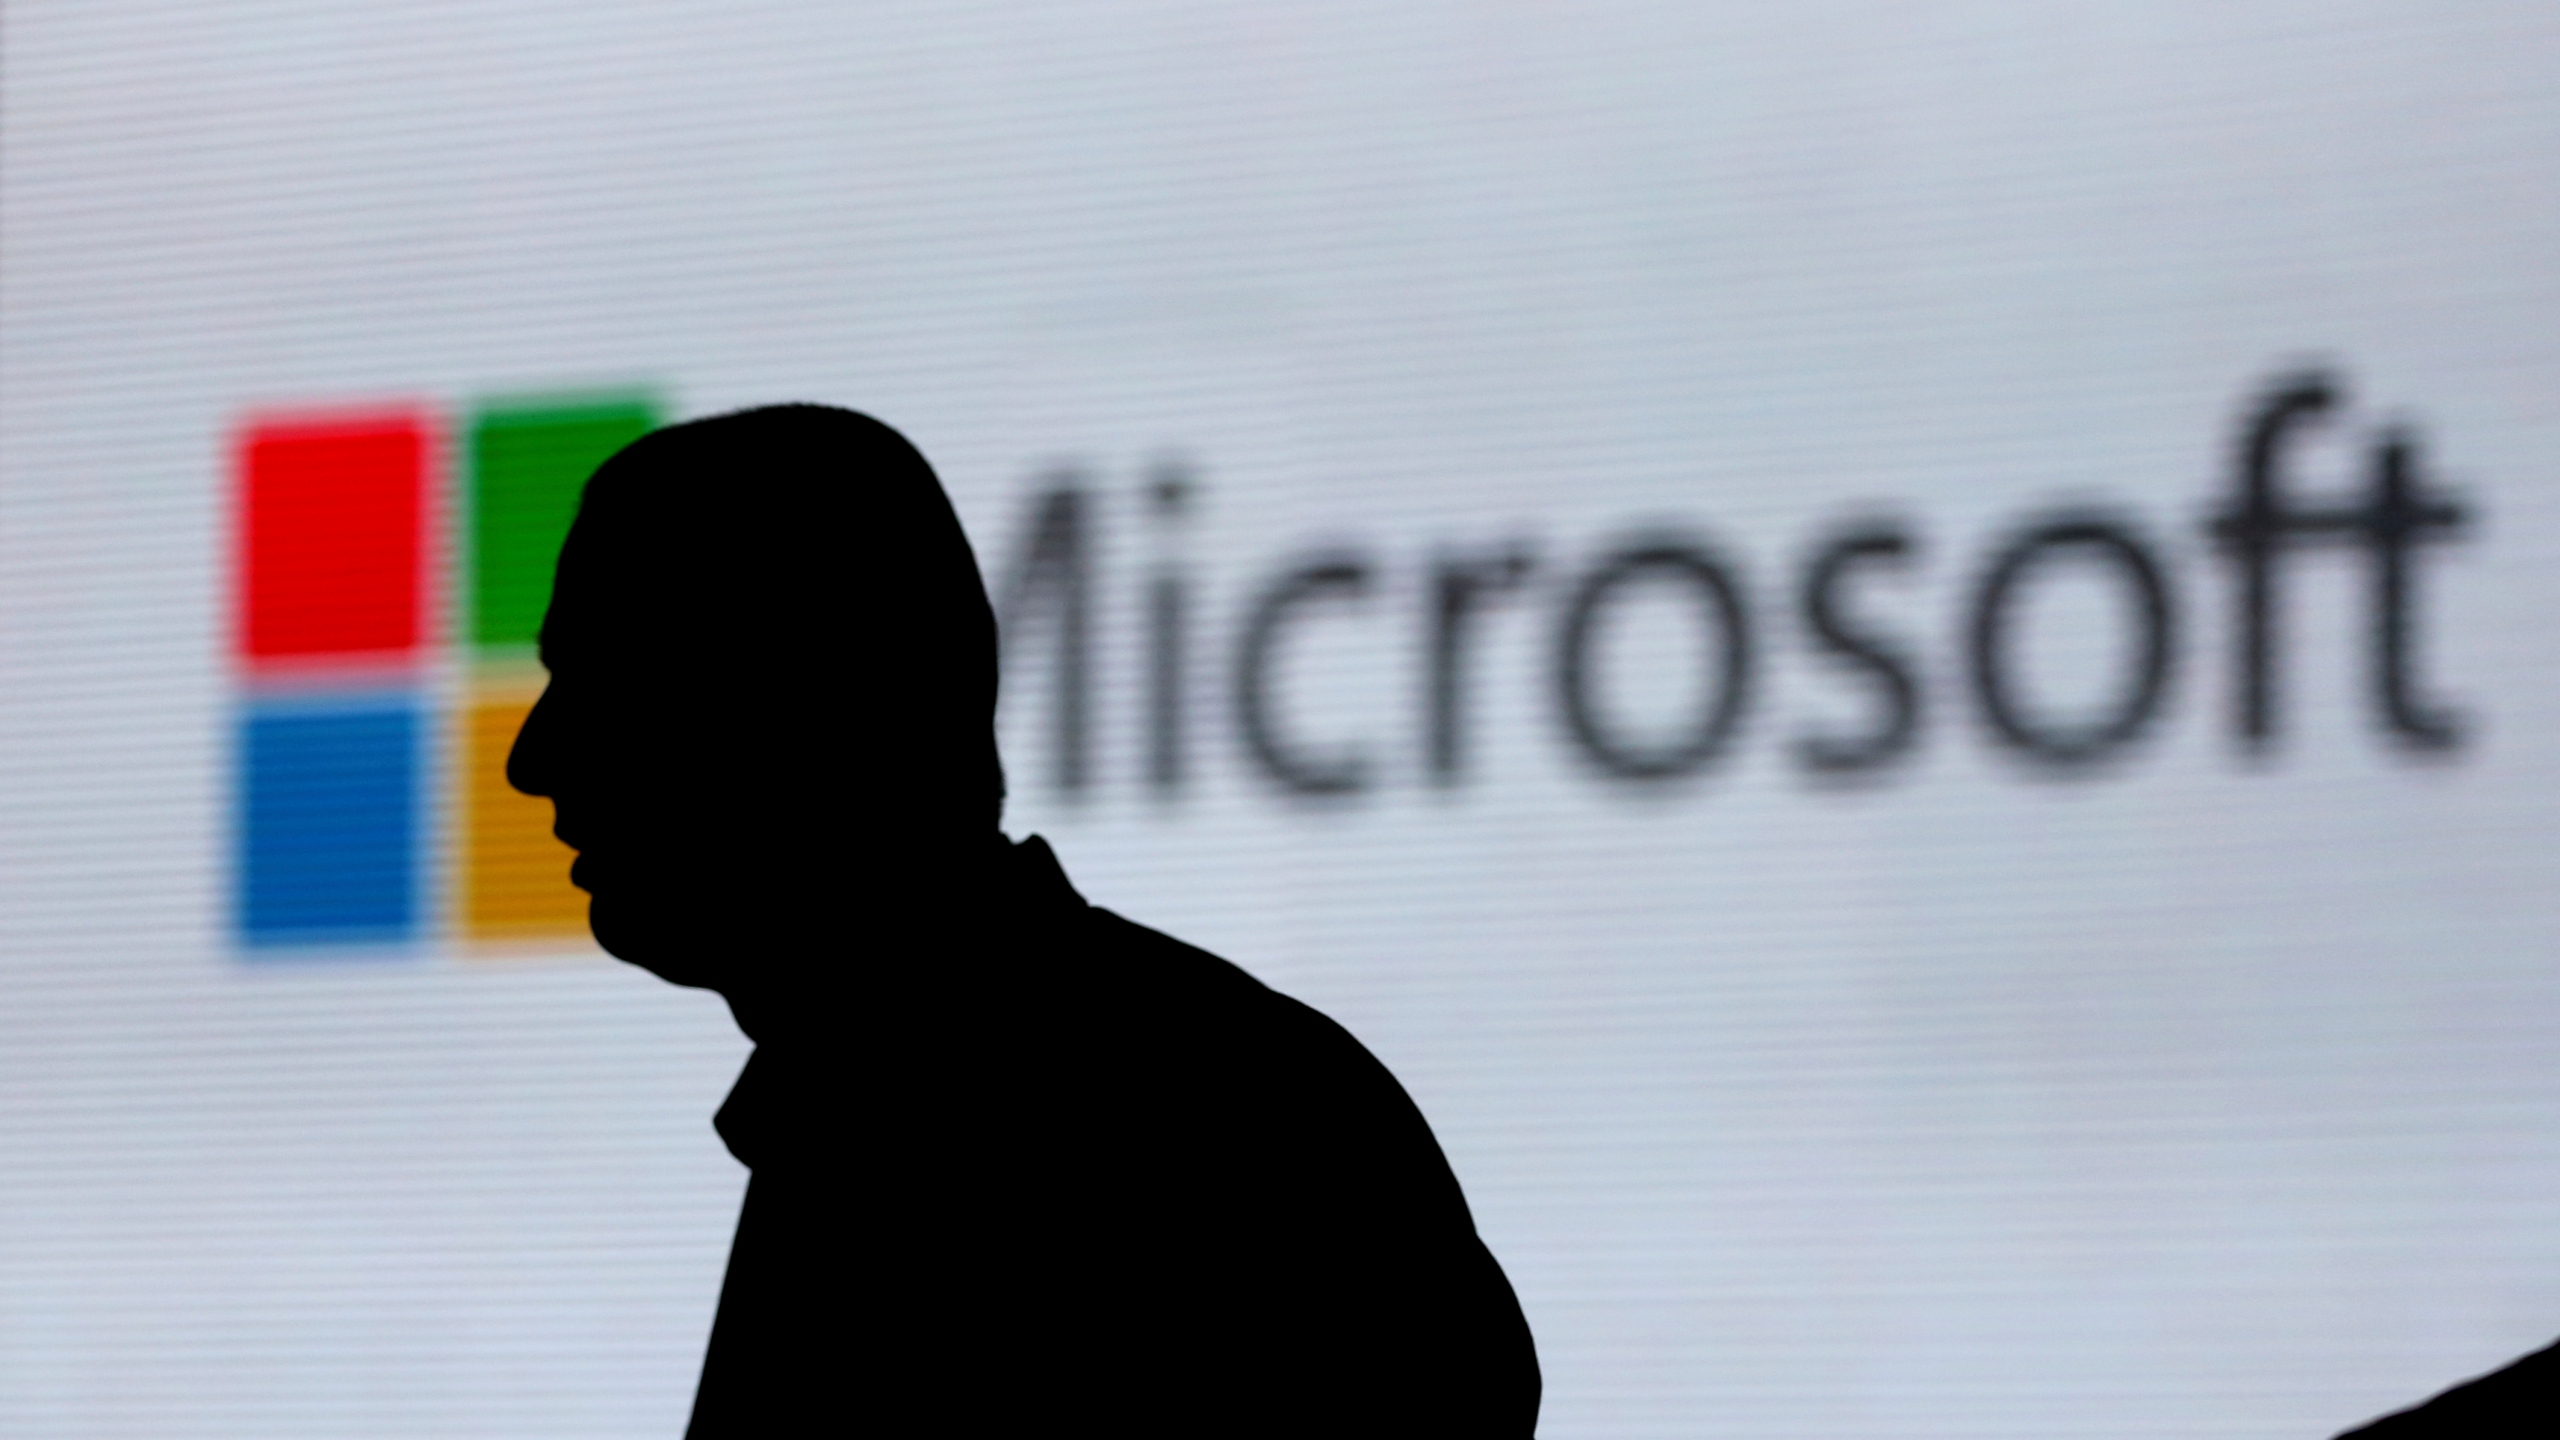 Microsoft-Russian_Hacking_54821-159532.jpg61150246